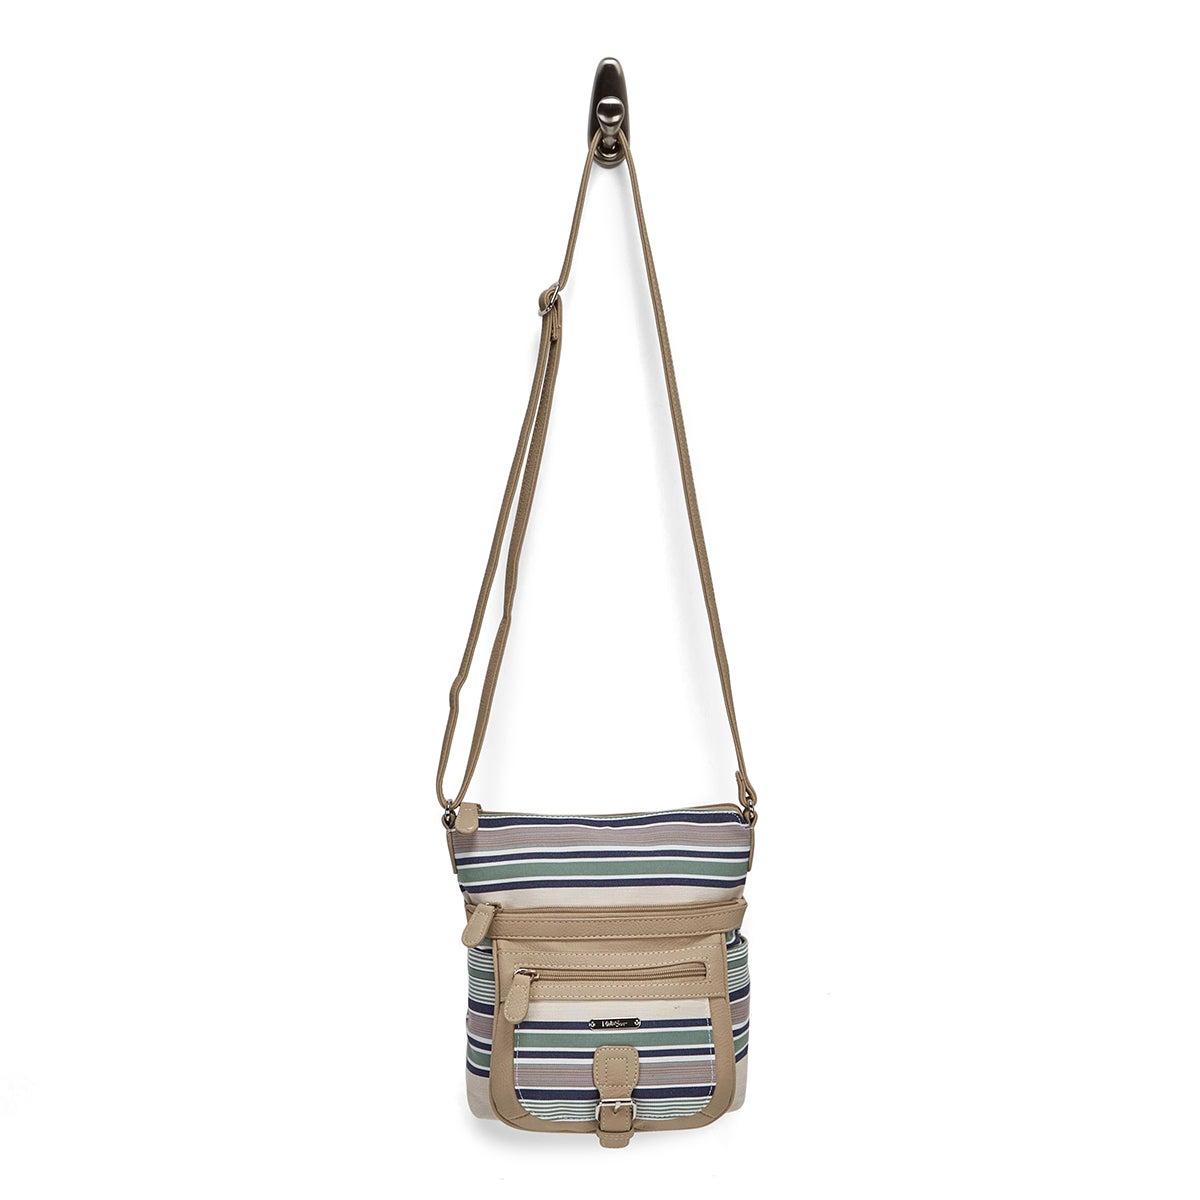 Lds blu stripe/chino crossbody bag